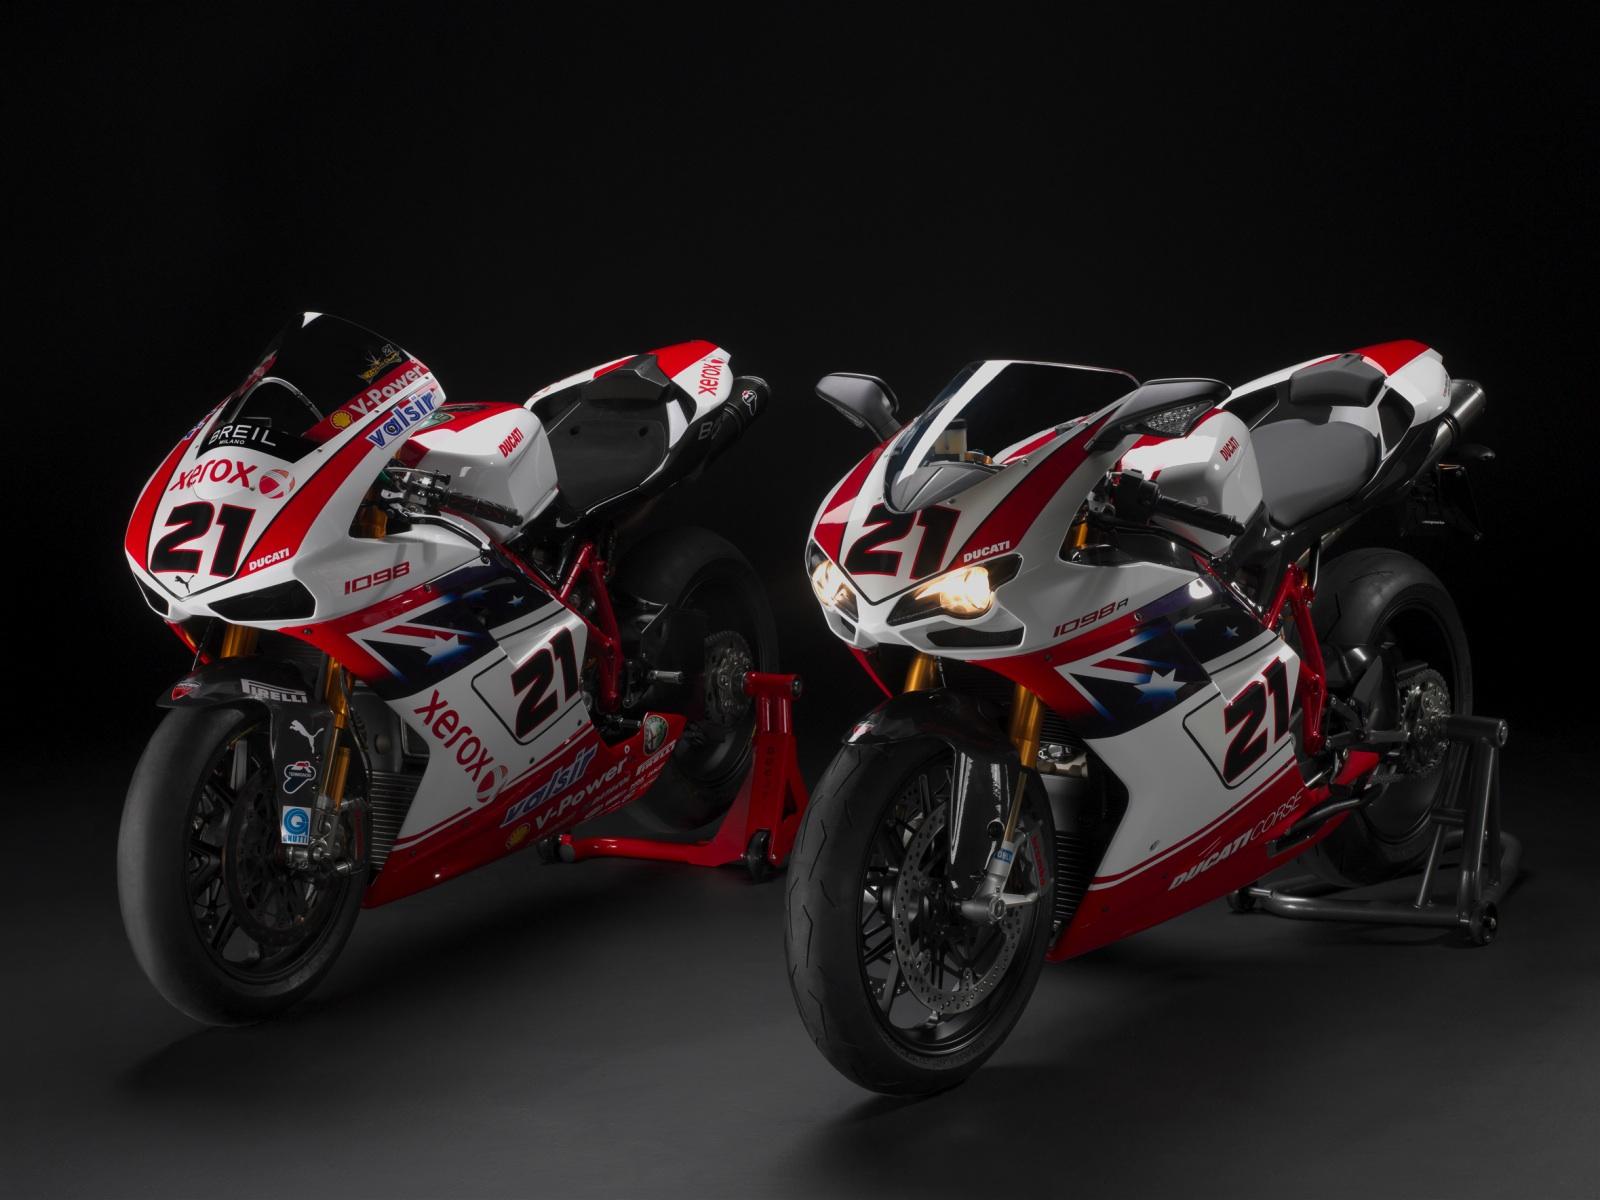 Ducati HD Wallpapers - 356.0KB